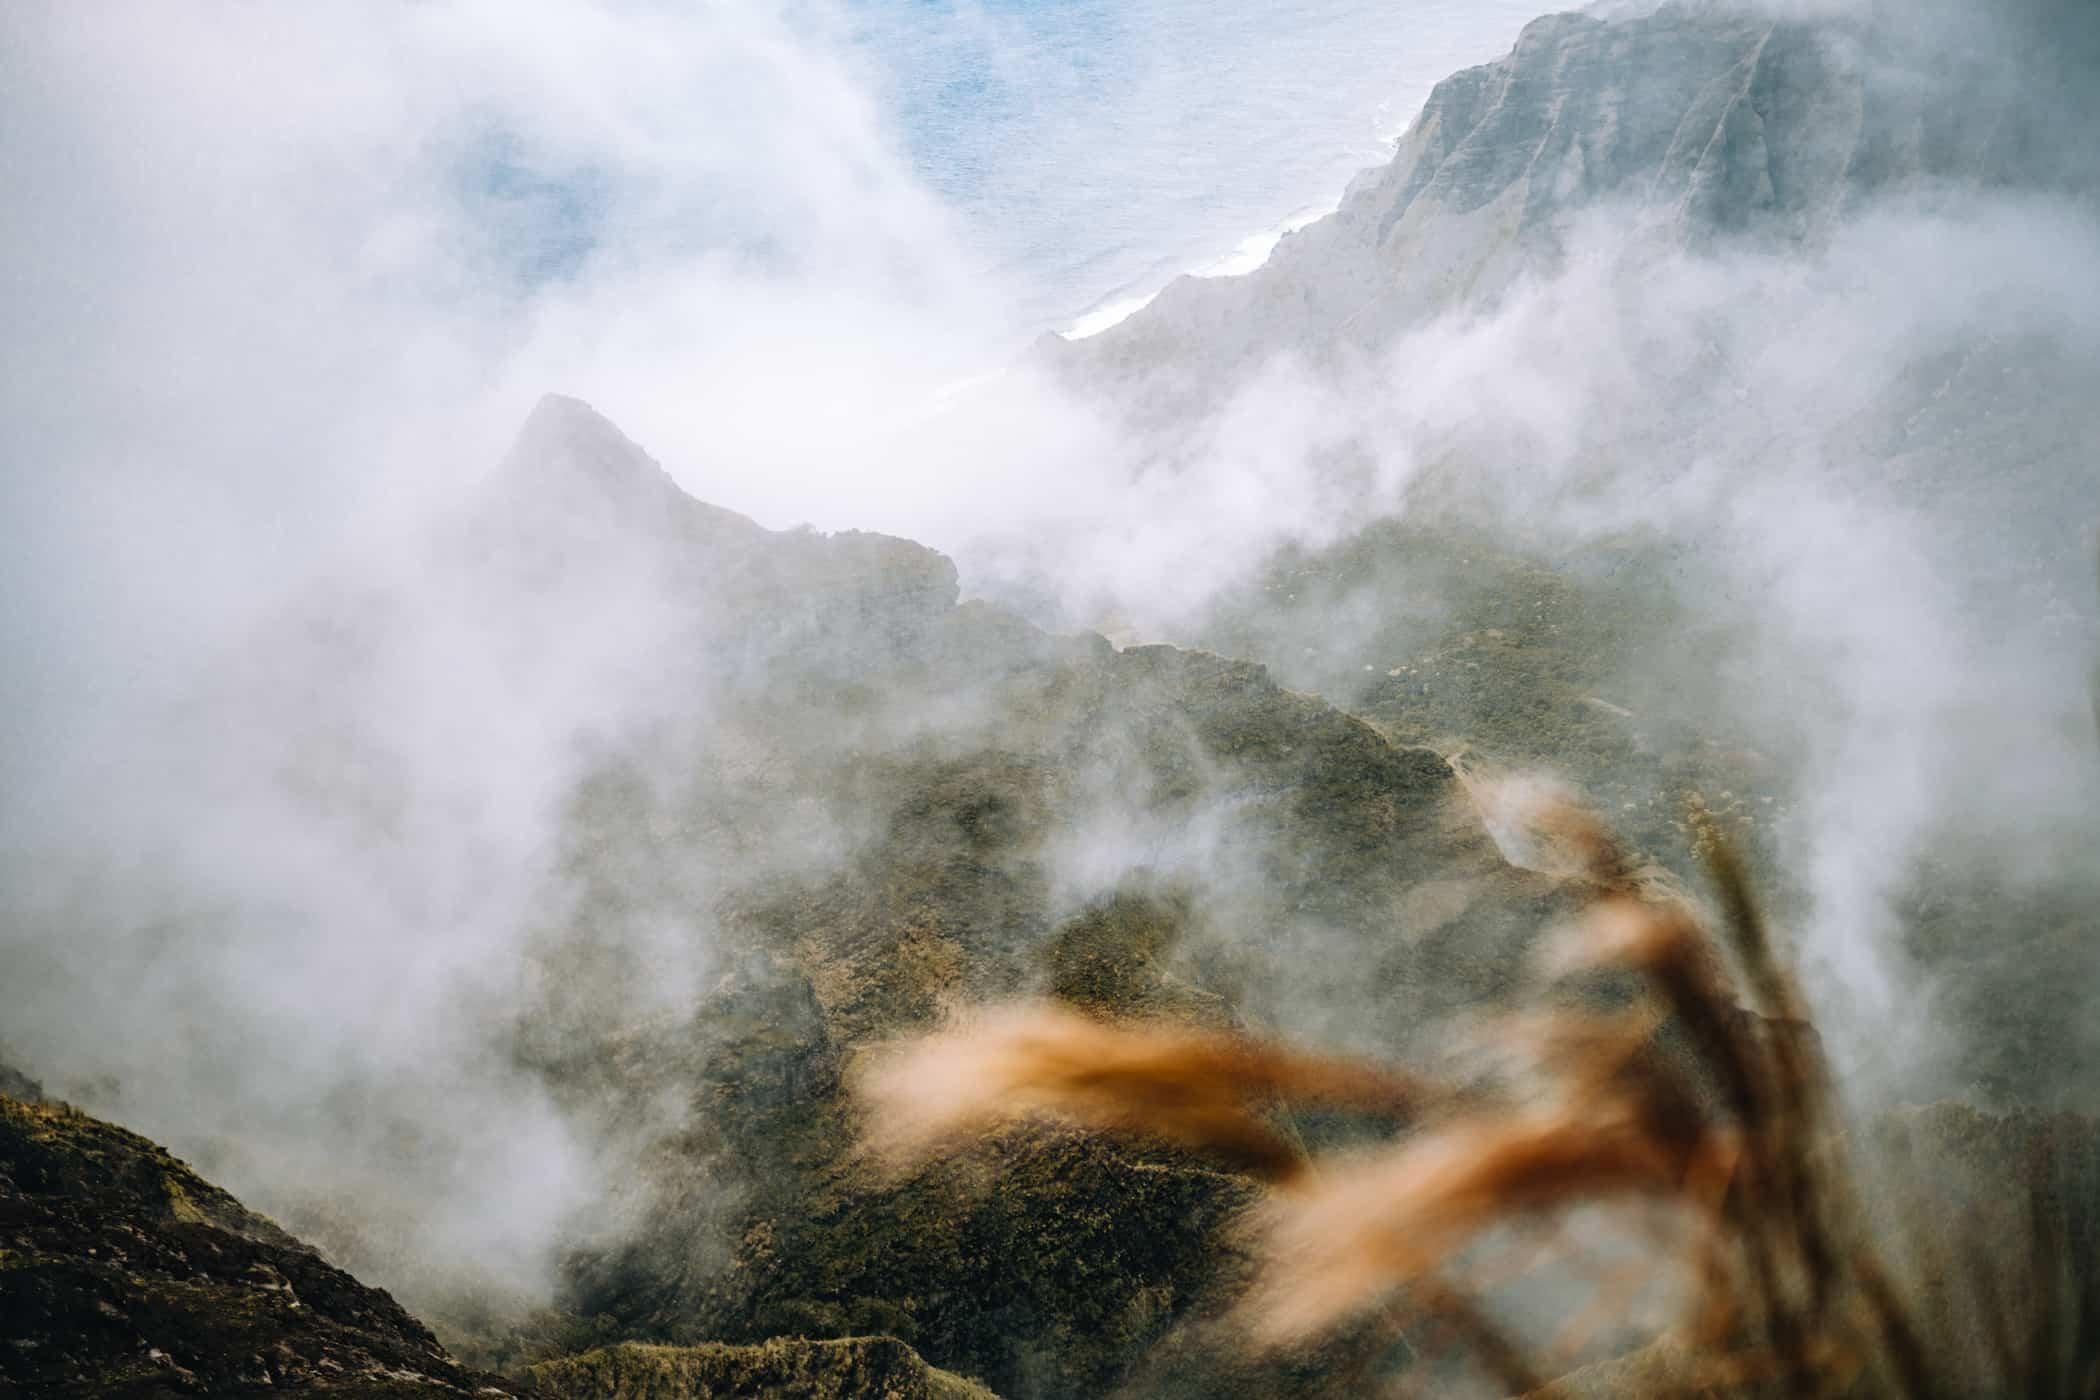 Kauai - Strände, Wandern & Ausflugsziele: Nebel am Kalepa Ridge Trail